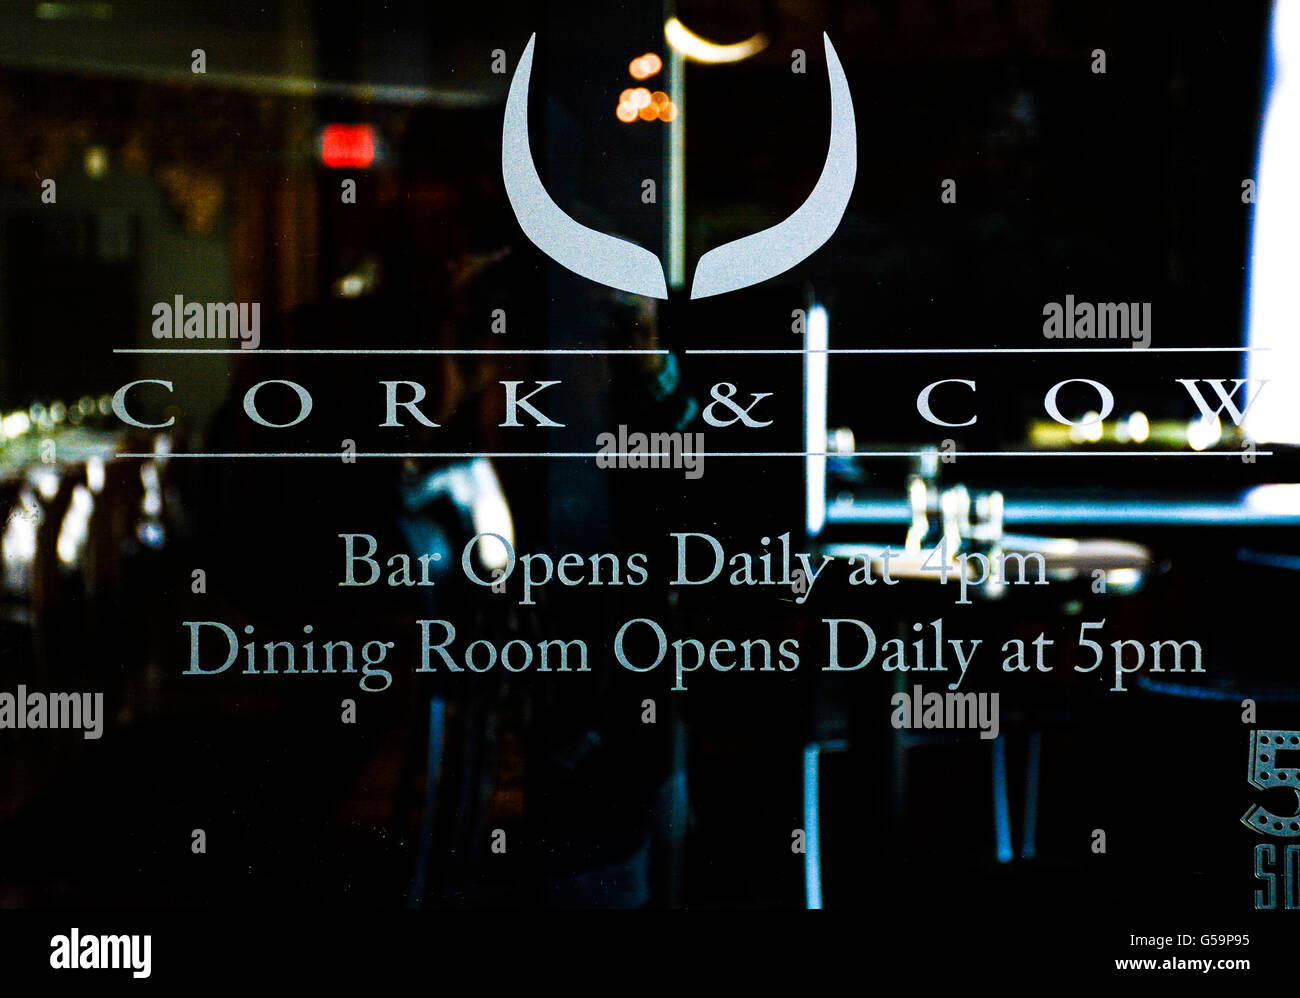 upscale restaurant decor stock photos & upscale restaurant decor